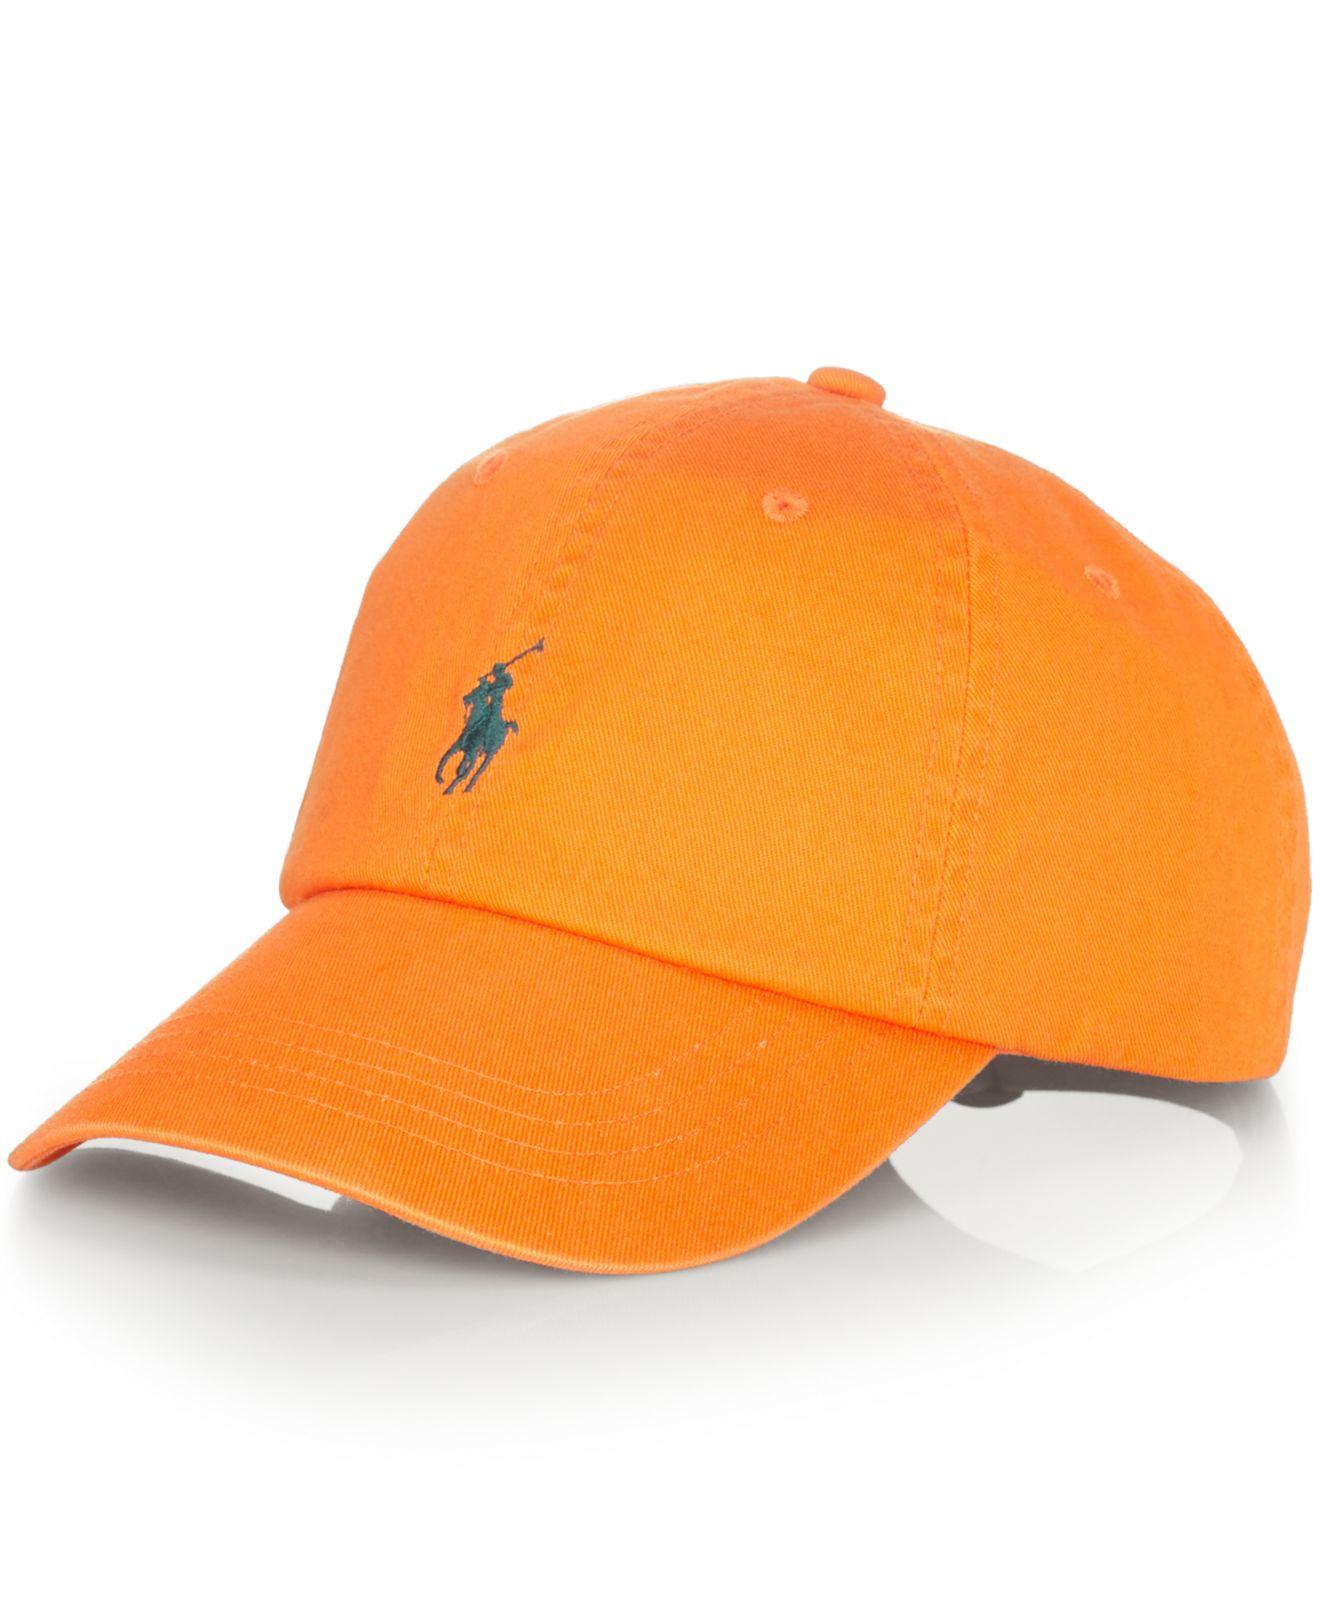 polo ralph lauren classic chino sports cap in orange for. Black Bedroom Furniture Sets. Home Design Ideas